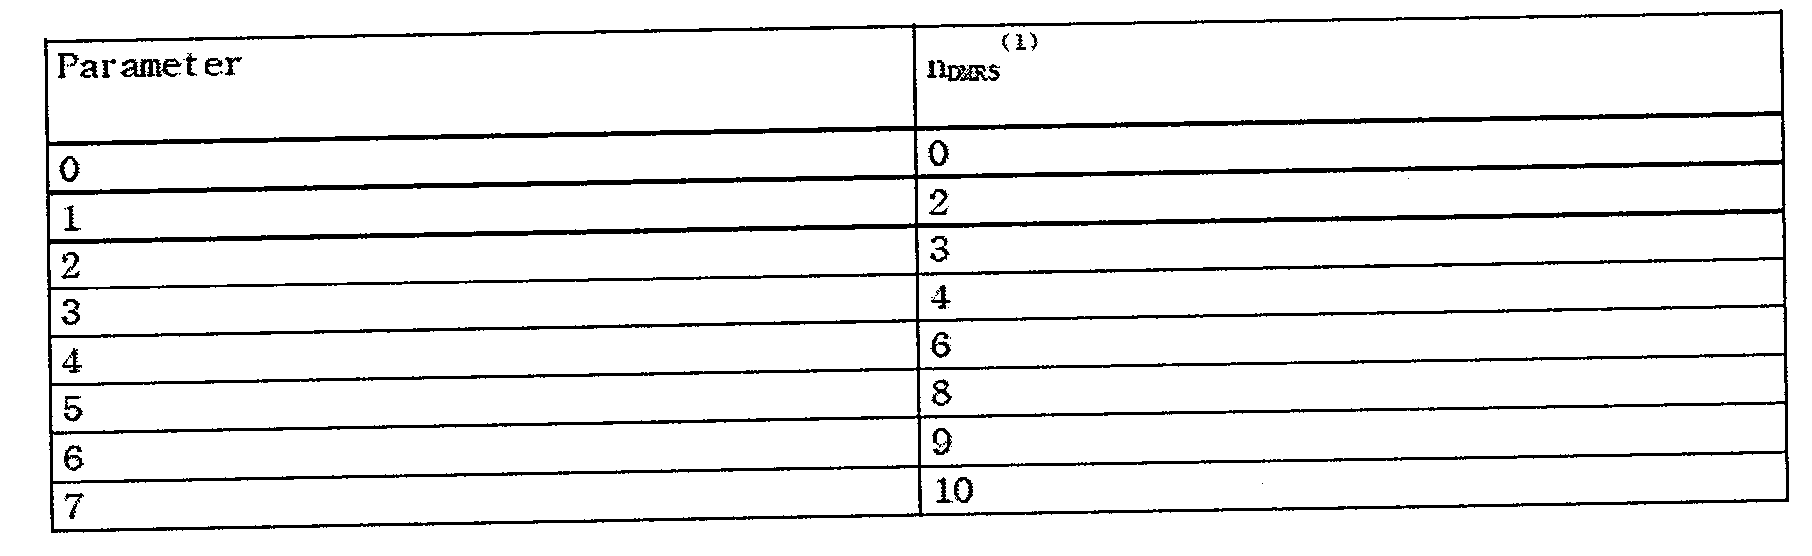 Figure 112011500951185-pat00116